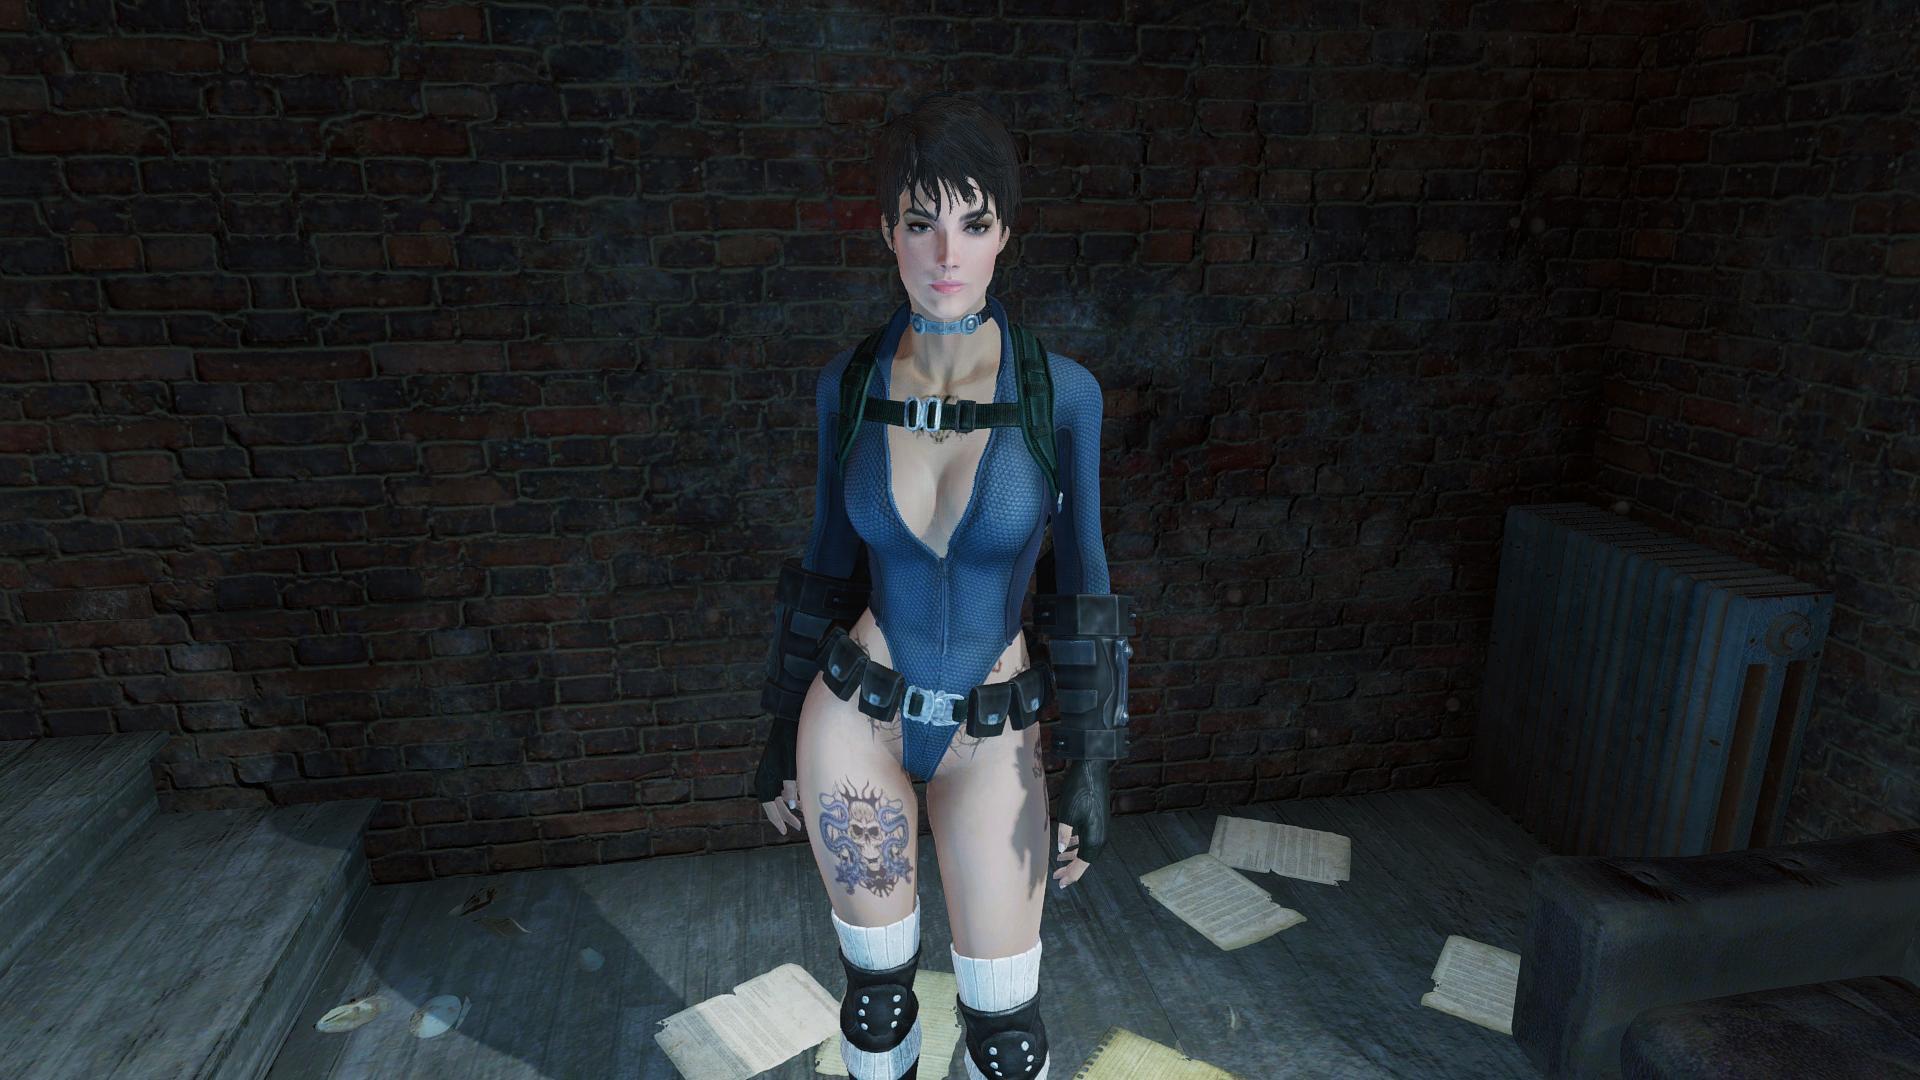 000591.Jpg - Fallout 4